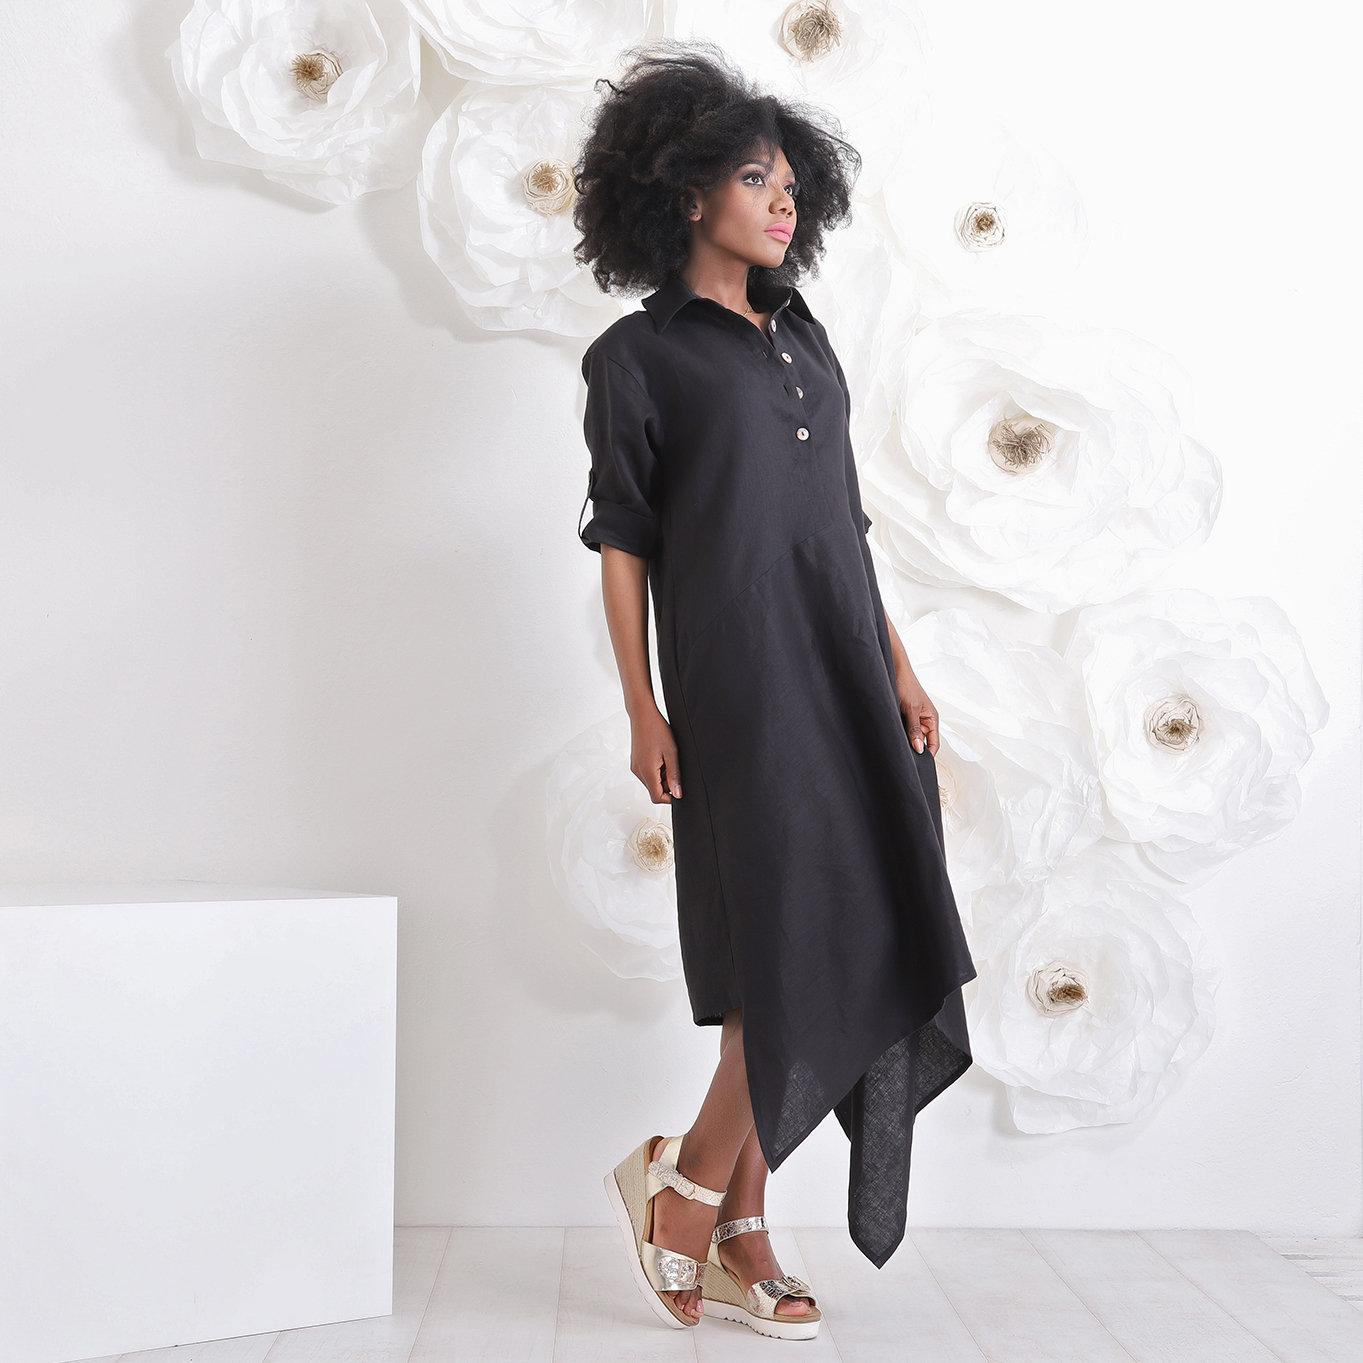 Spiksplinternieuw Mooie zwarte linnen jurk - House of Festivals NA-48